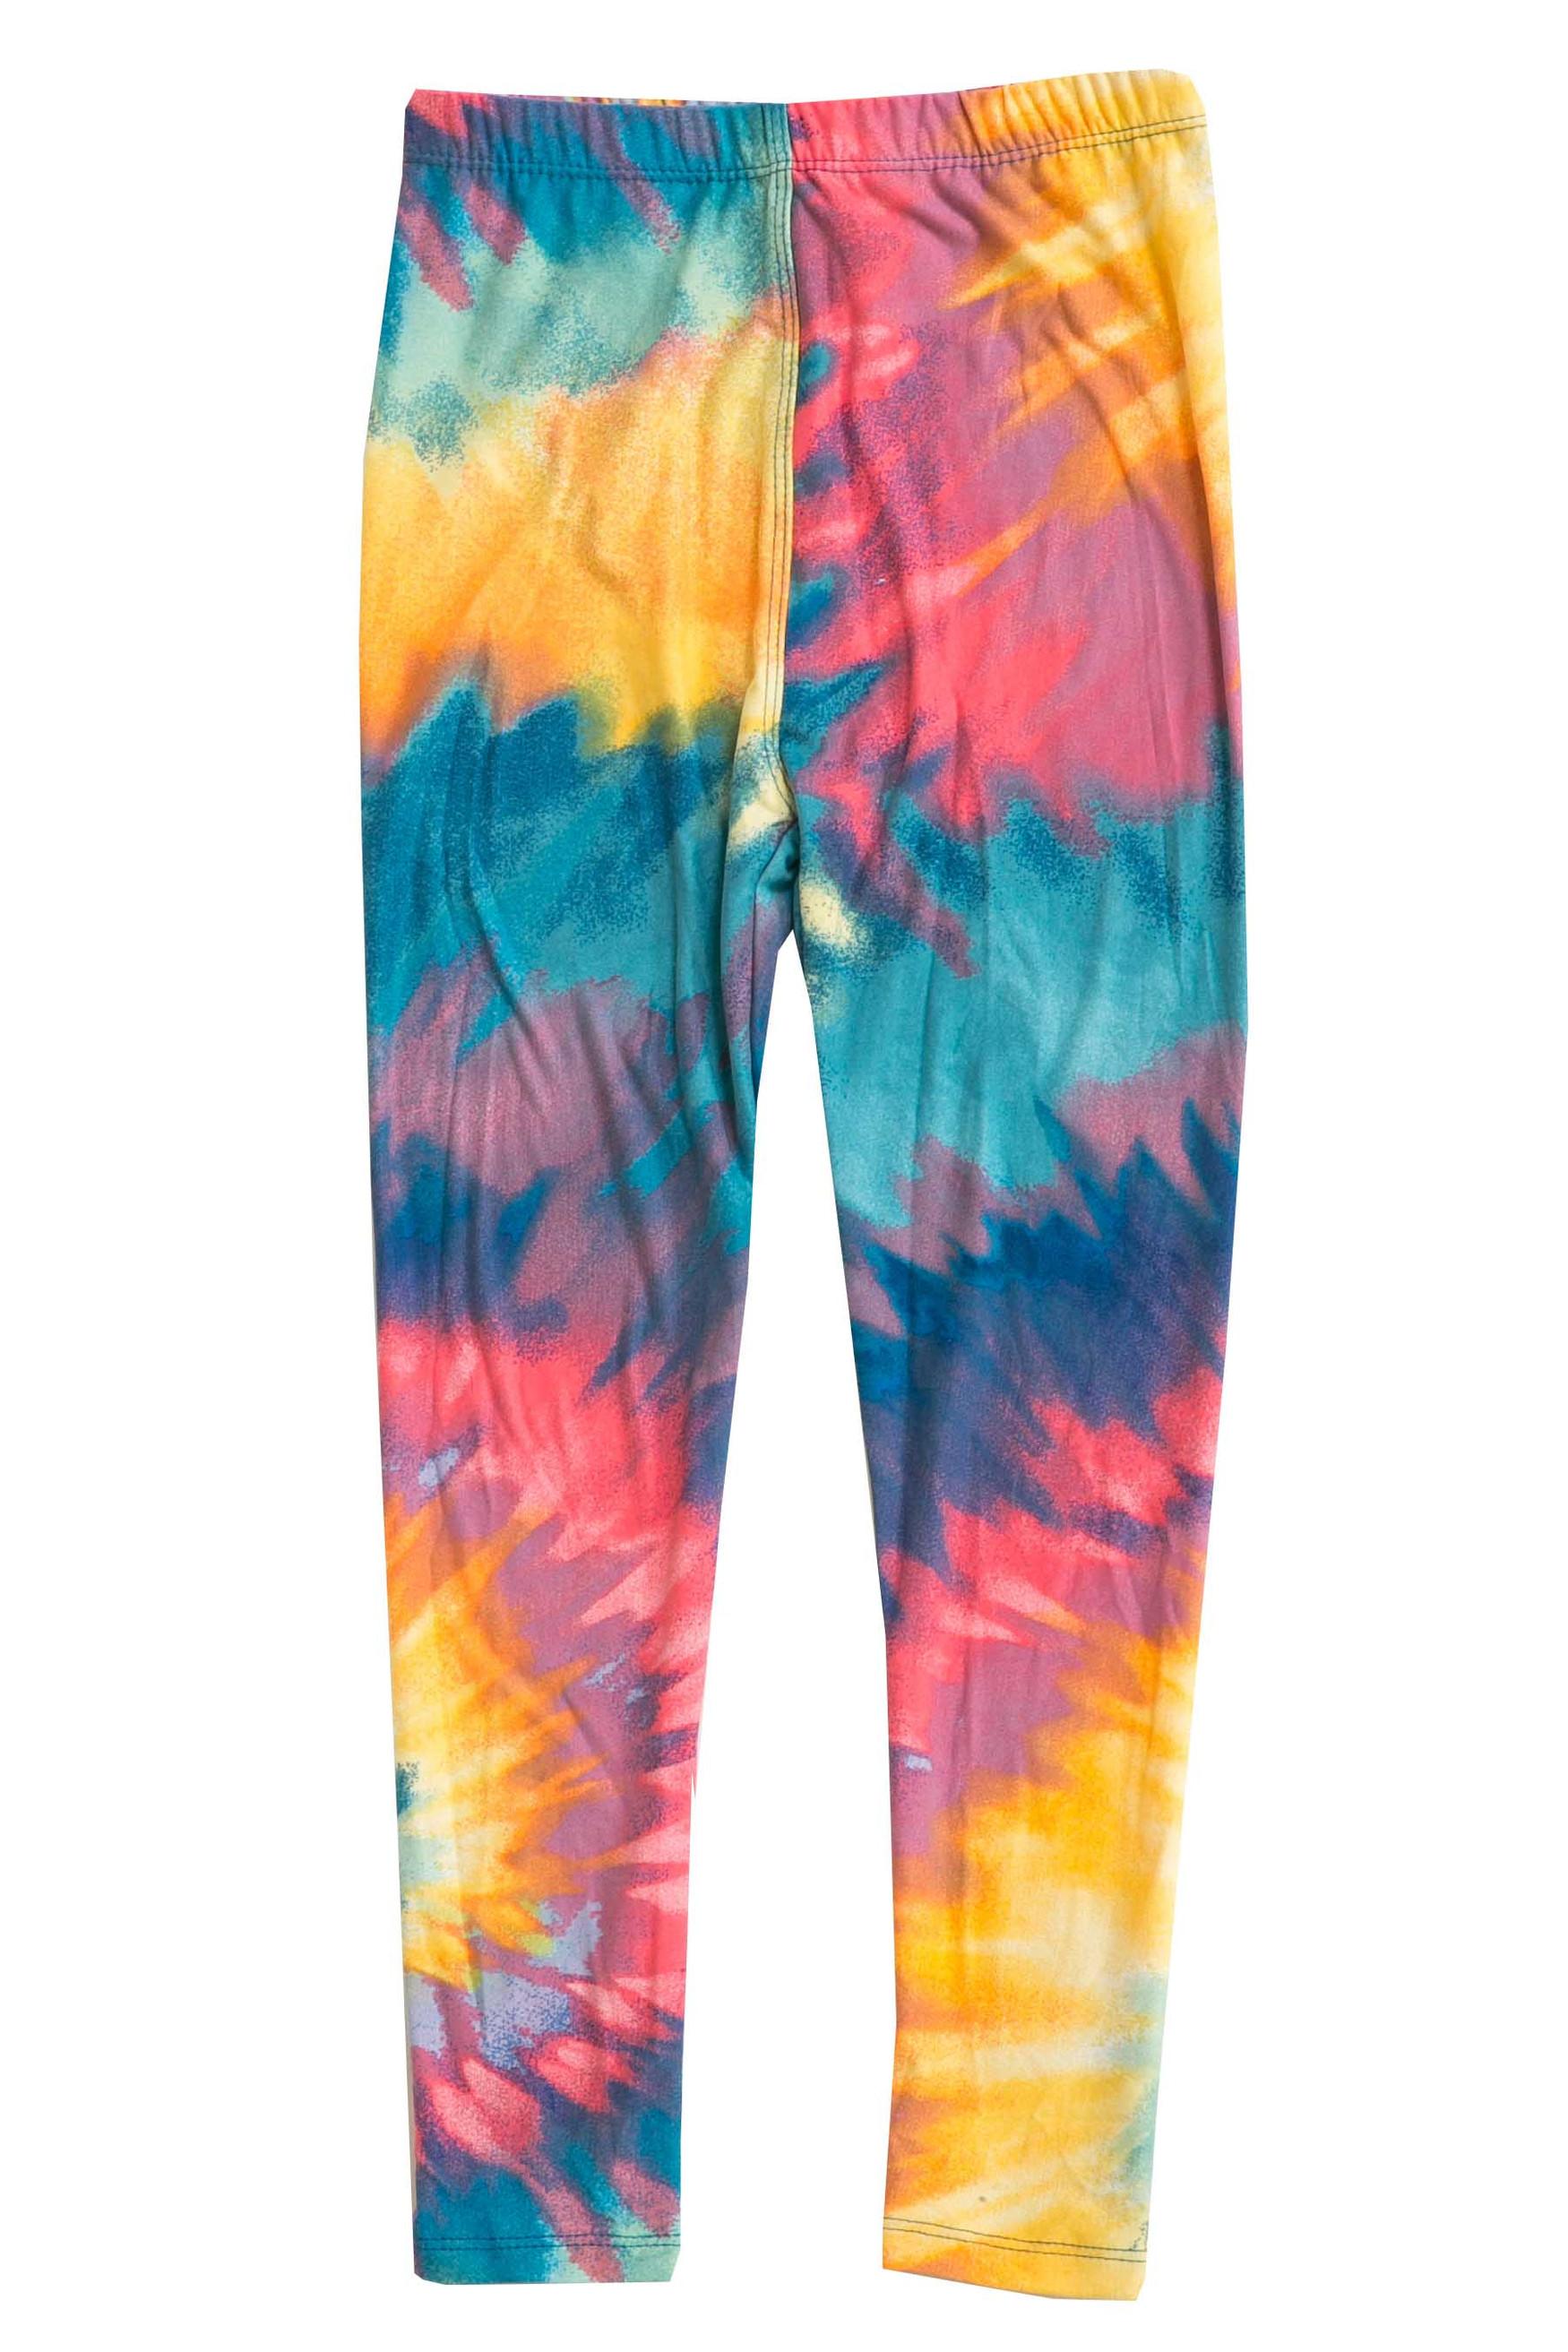 Buttery Soft Multi-Color-Bold Tie Dye Kids Leggings